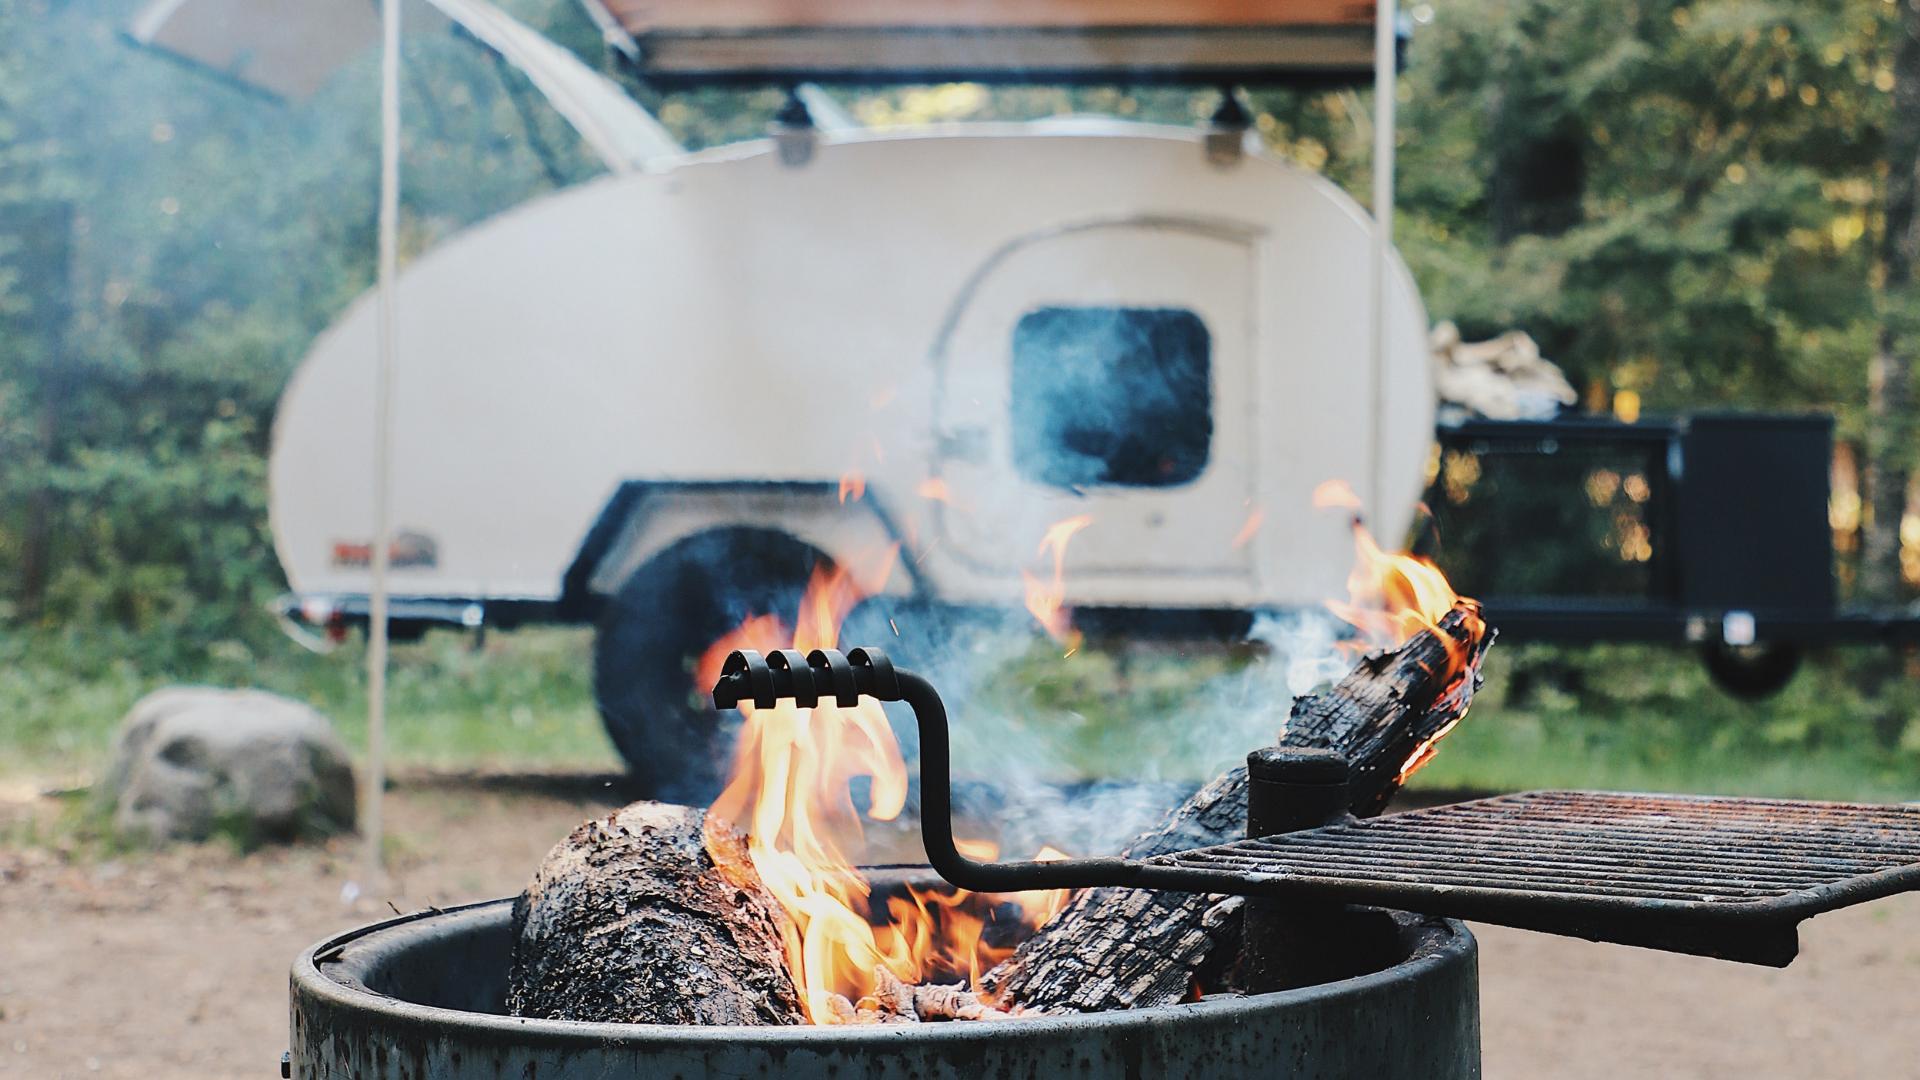 Choosing Between an RV and Camper